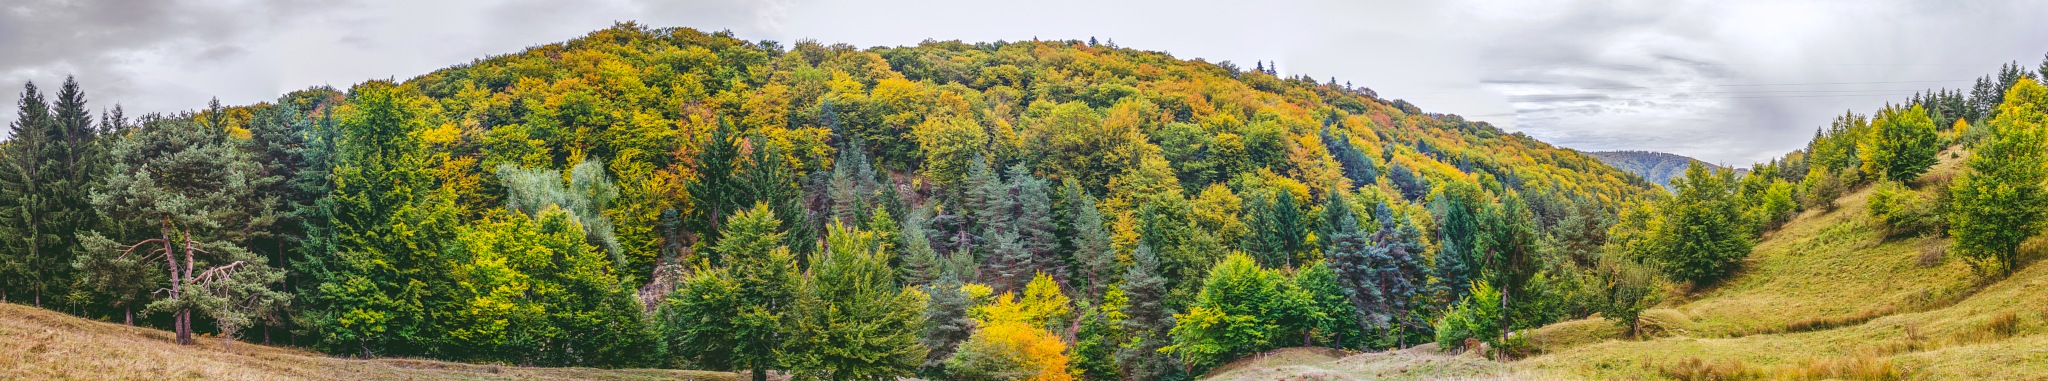 Autumn panorama by IonutAlexandru